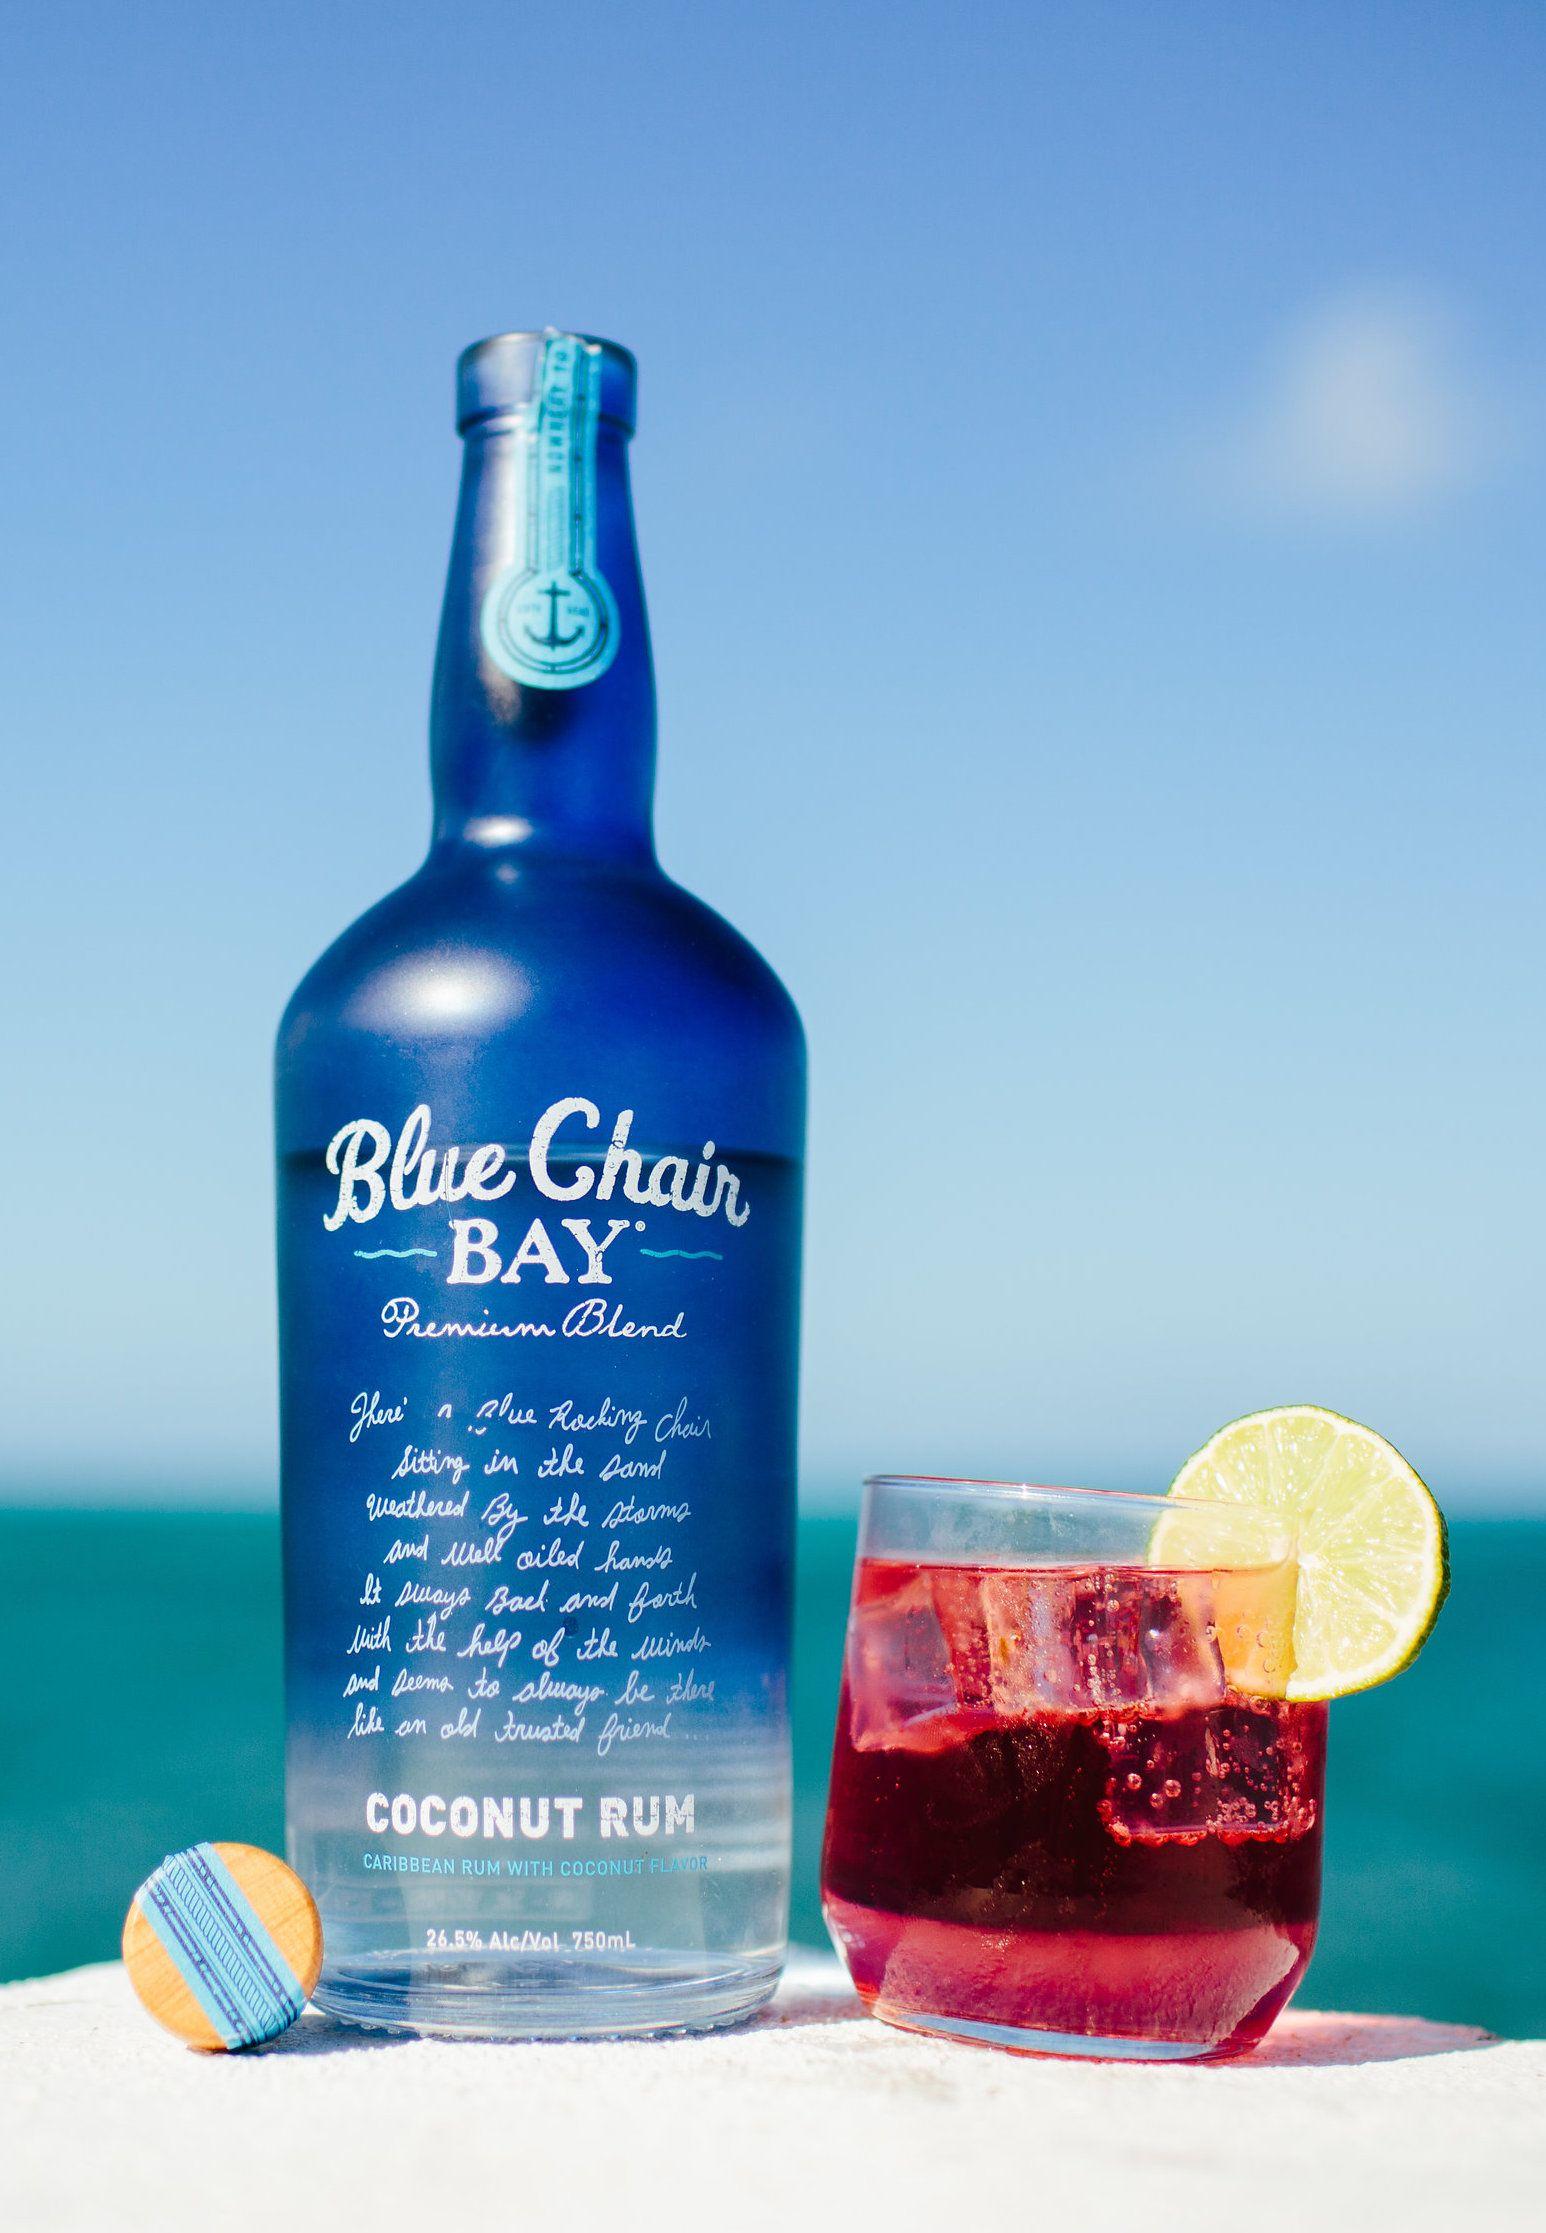 COASTAL COCKTAIL 1 5 oz Blue Chair Bay Coconut Rum 3 oz